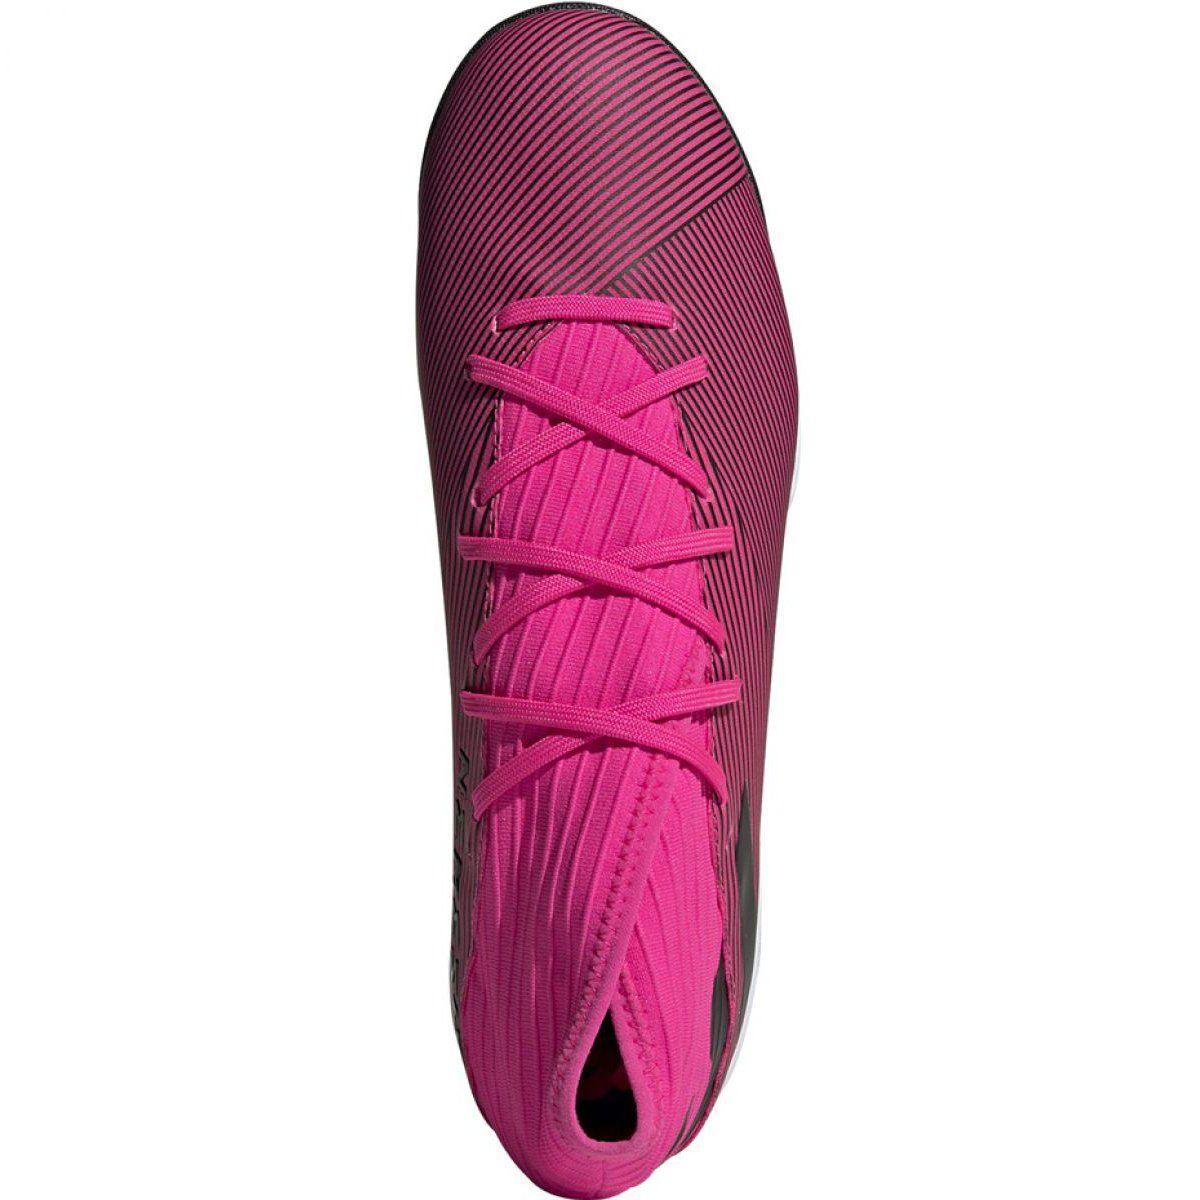 Buty Pilkarskie Adidas Nemeziz 19 3 Tf M F34426 Rozowe Czarne Pink Adidas Football Boots Football Shoes